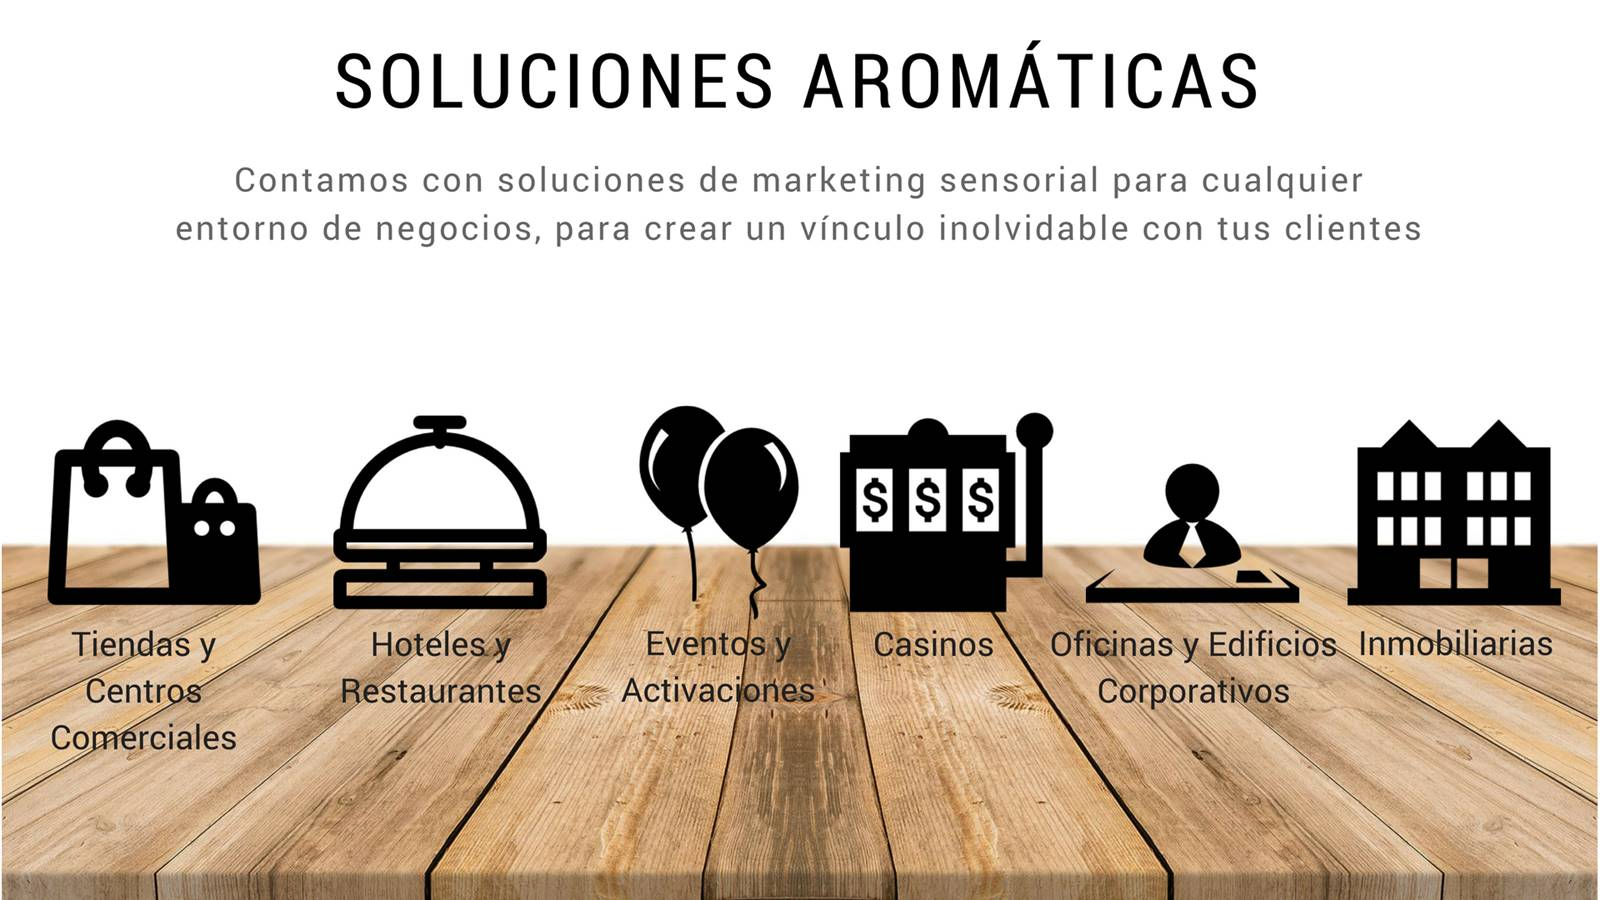 soluciones aromaticas para empresas